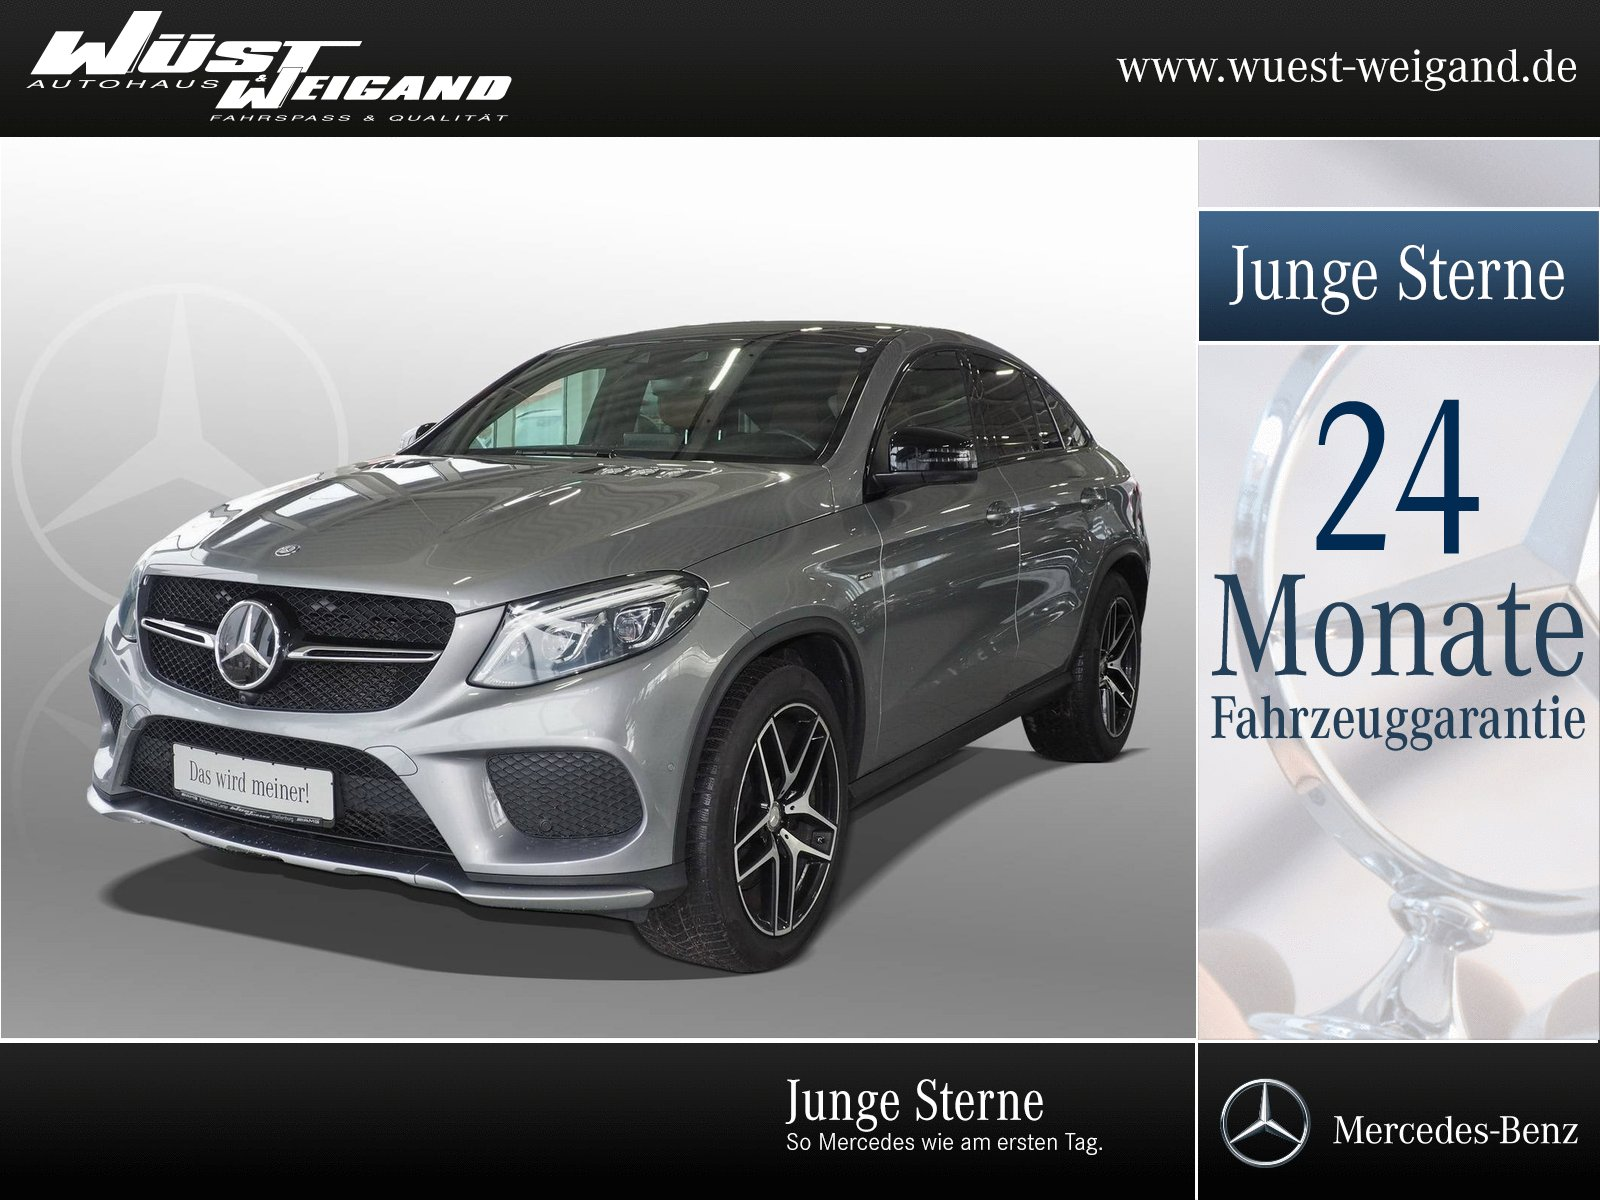 Mercedes-Benz GLE 450 AMG 4MATIC Coupé Standh.+Distronic+Fond., Jahr 2016, Benzin